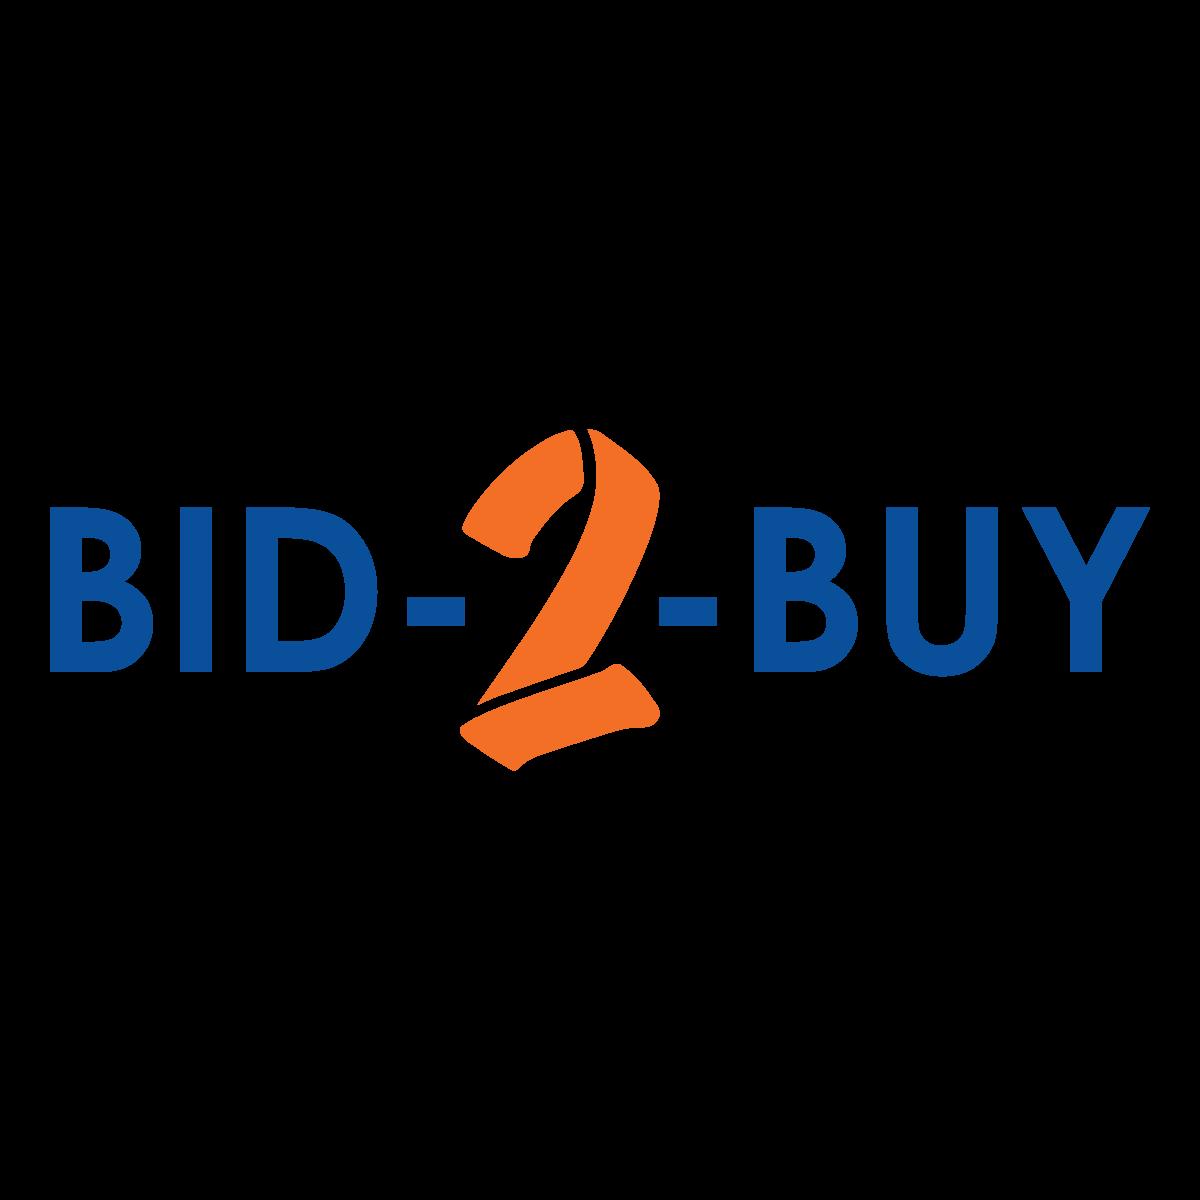 Bid 2 Buy Online Auction Marketplace